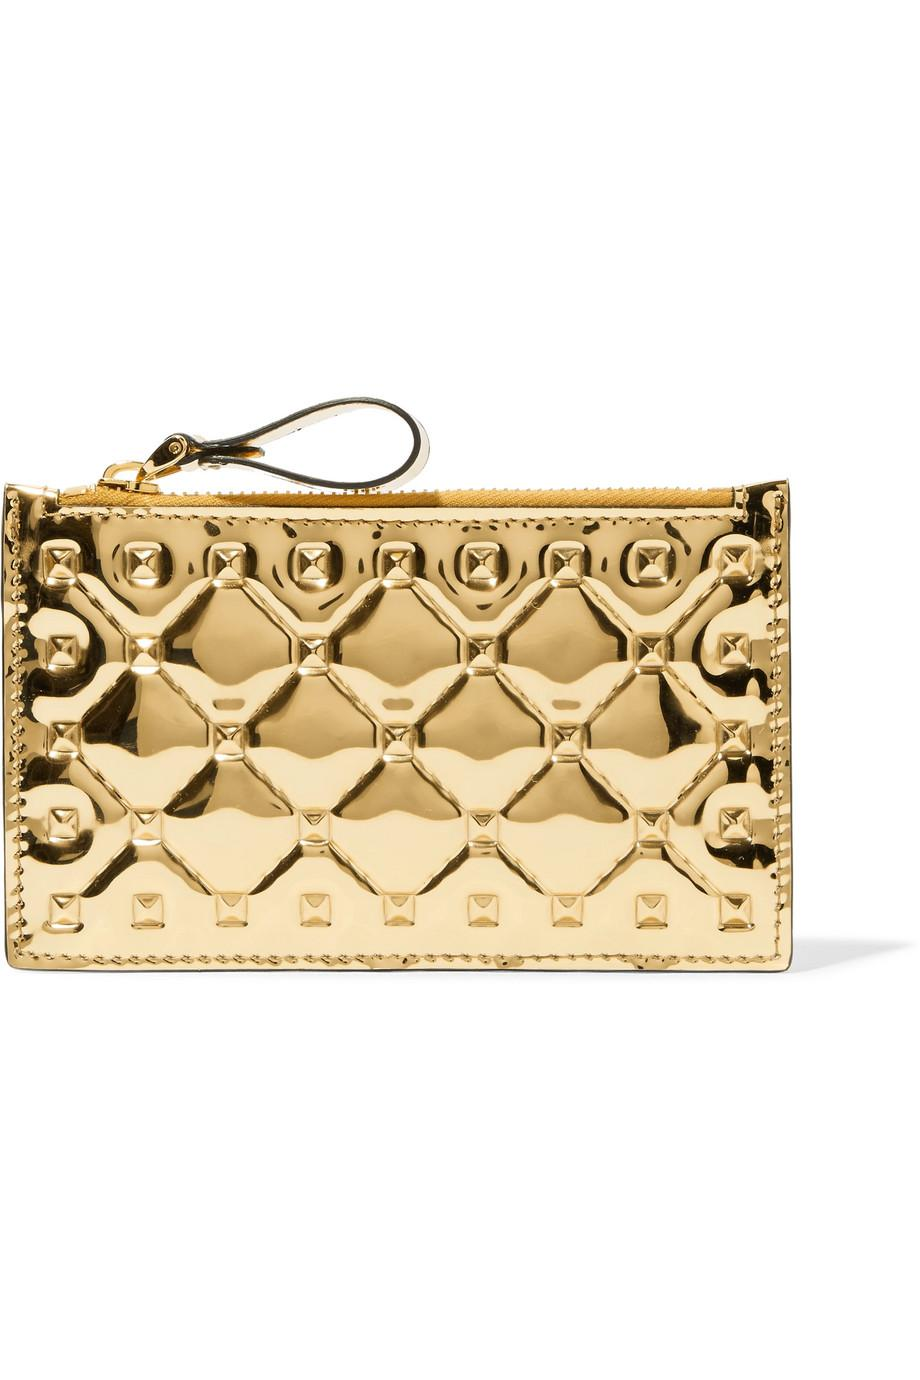 Valentino Garavani The Rockstud Spike Embossed Mirrored-leather Wallet - Gold Valentino P94rK